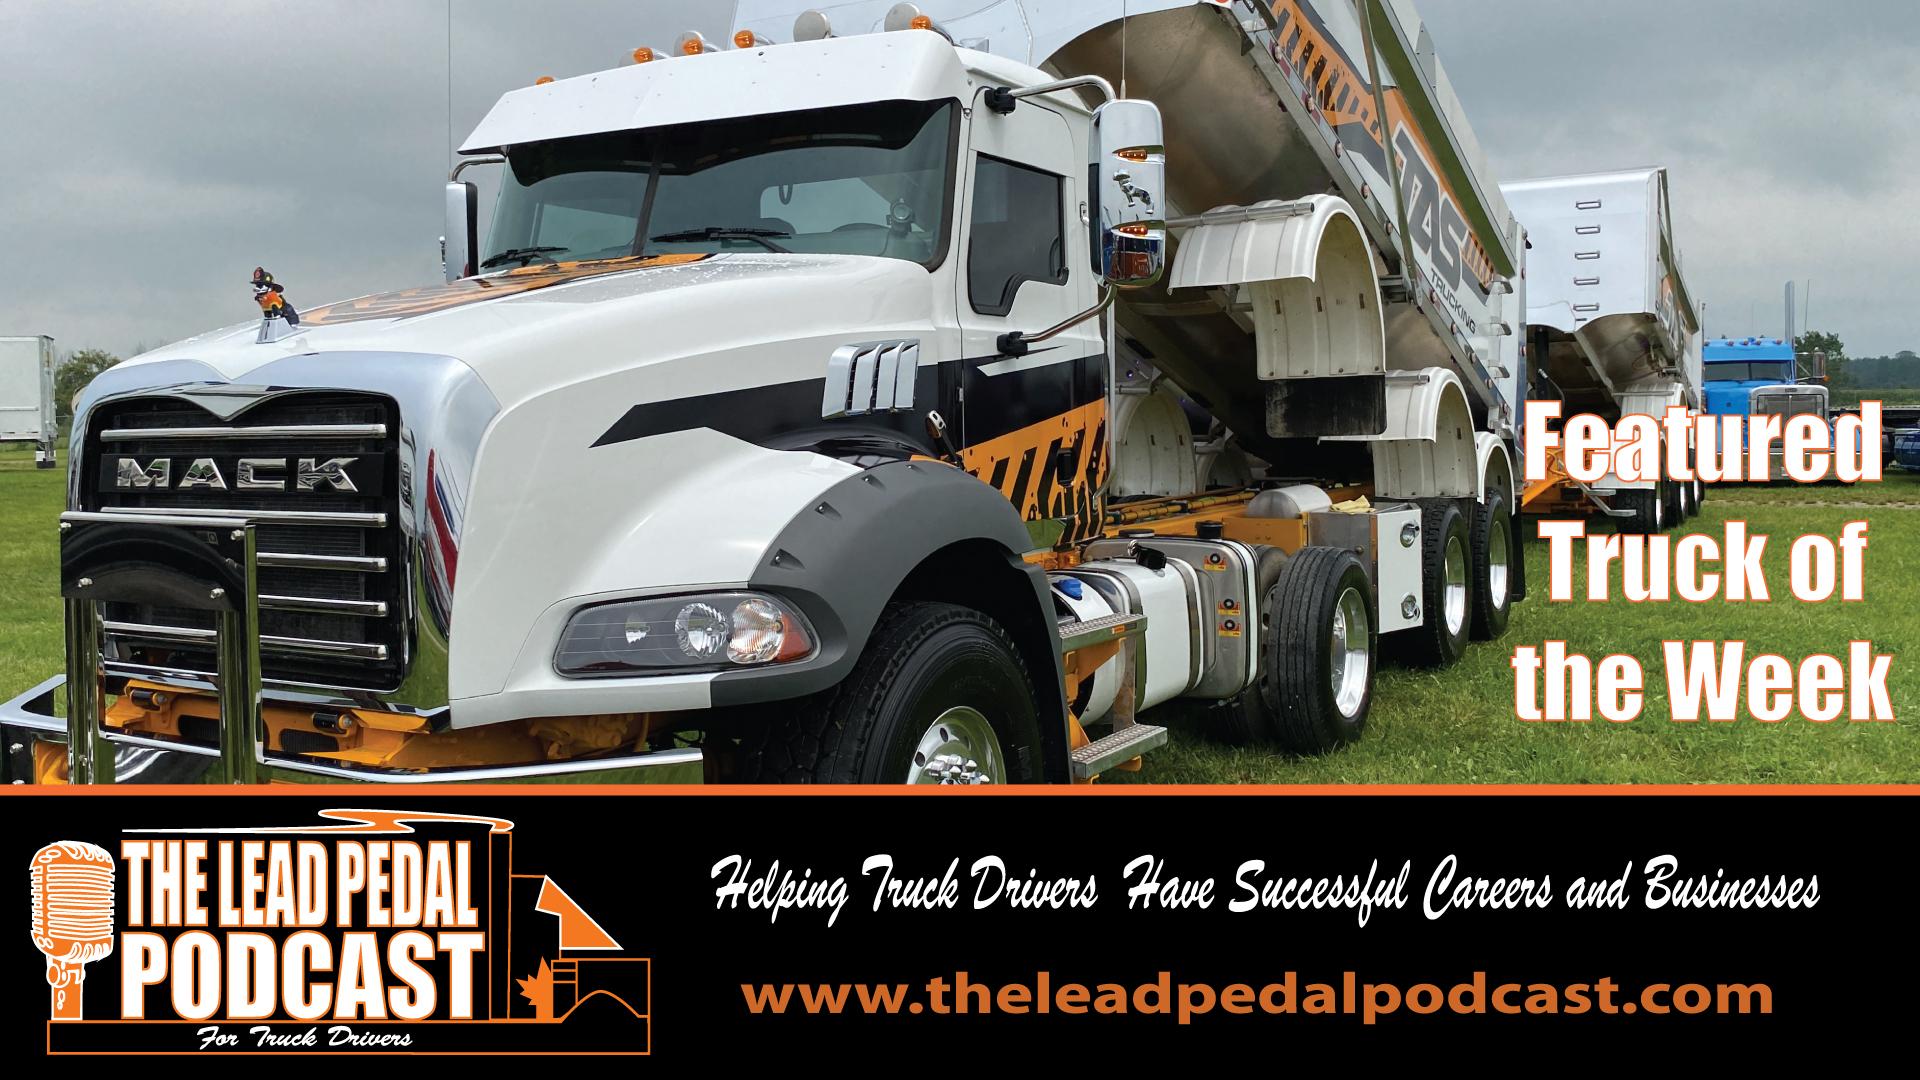 LP679 - Featured Truck of the Week - Tas Dump Combination